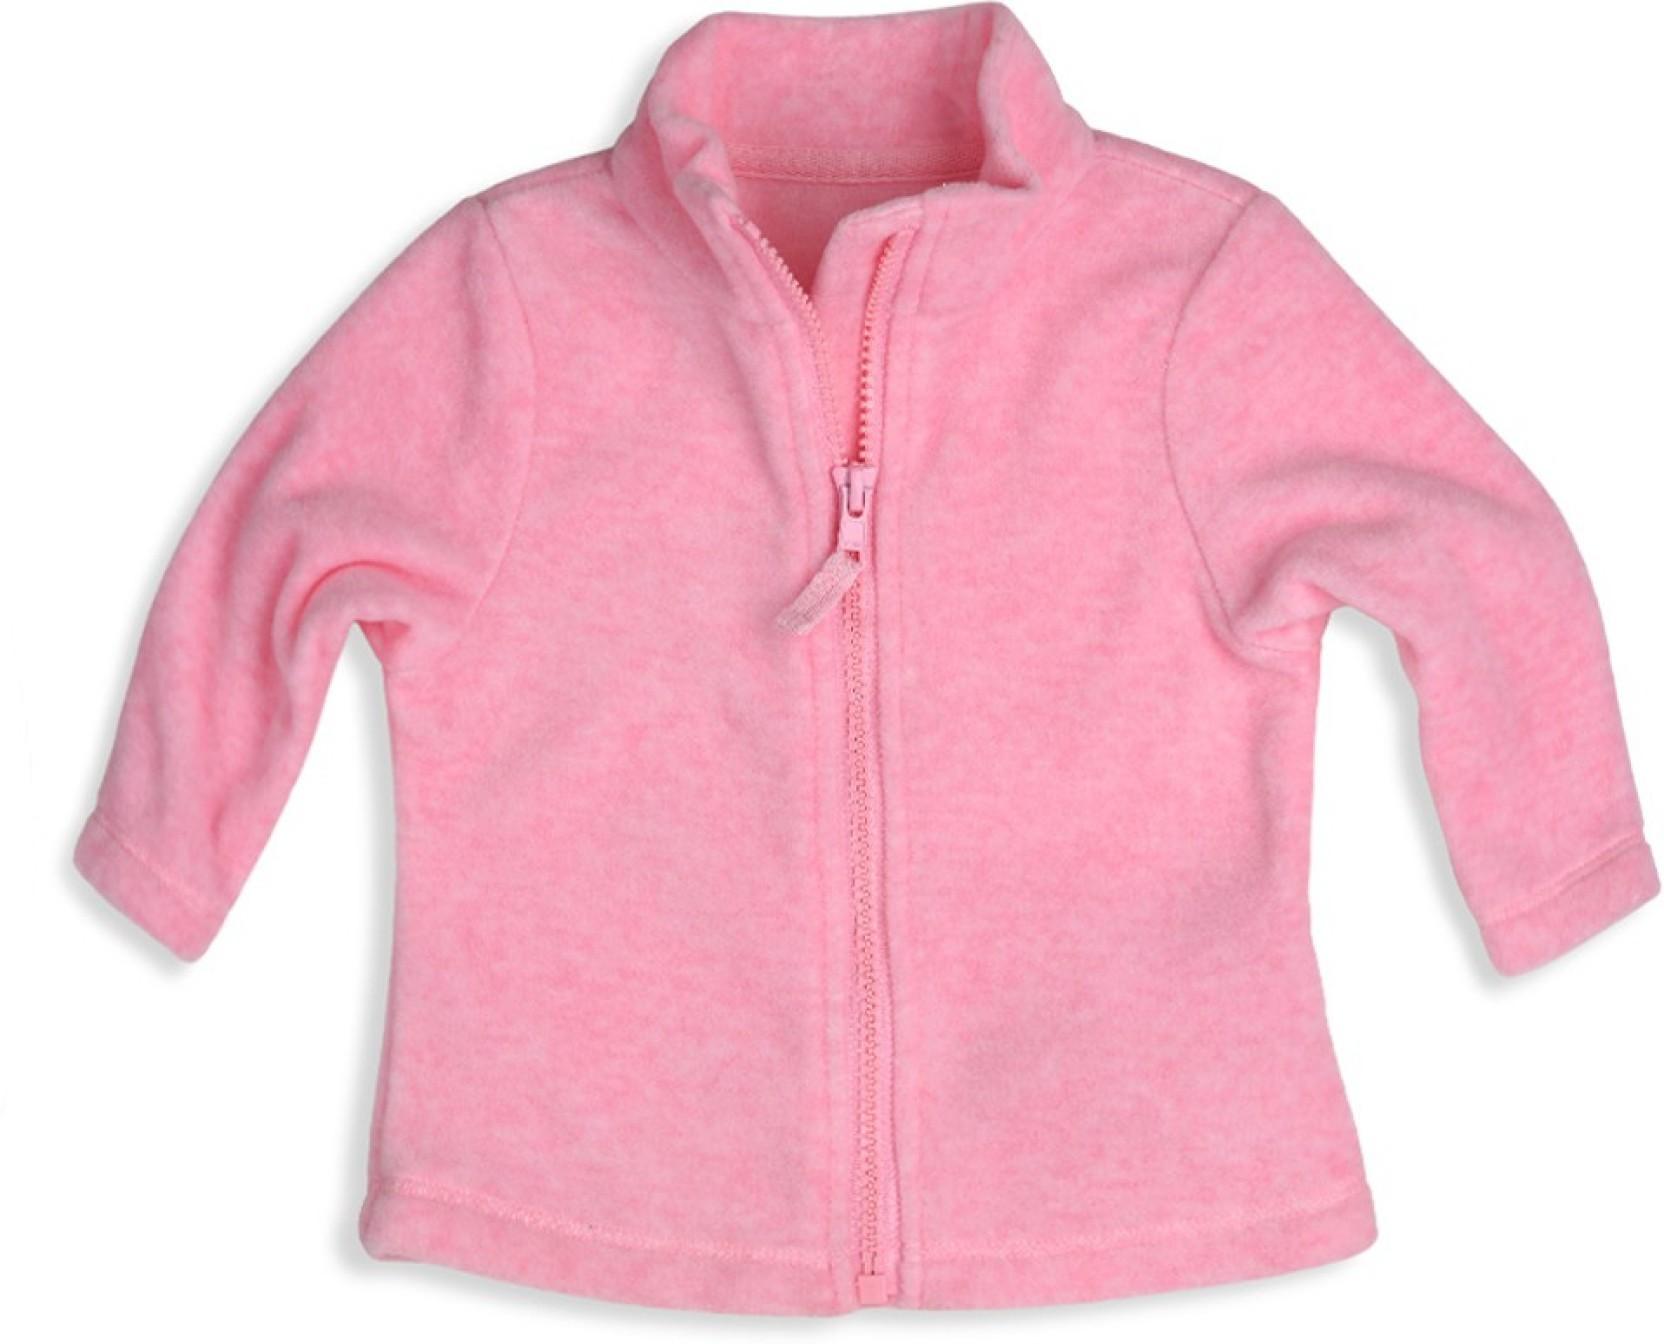 f810b2782 Mothercare Full Sleeve Solid Baby Girls Sweatshirt - Buy PINK ...